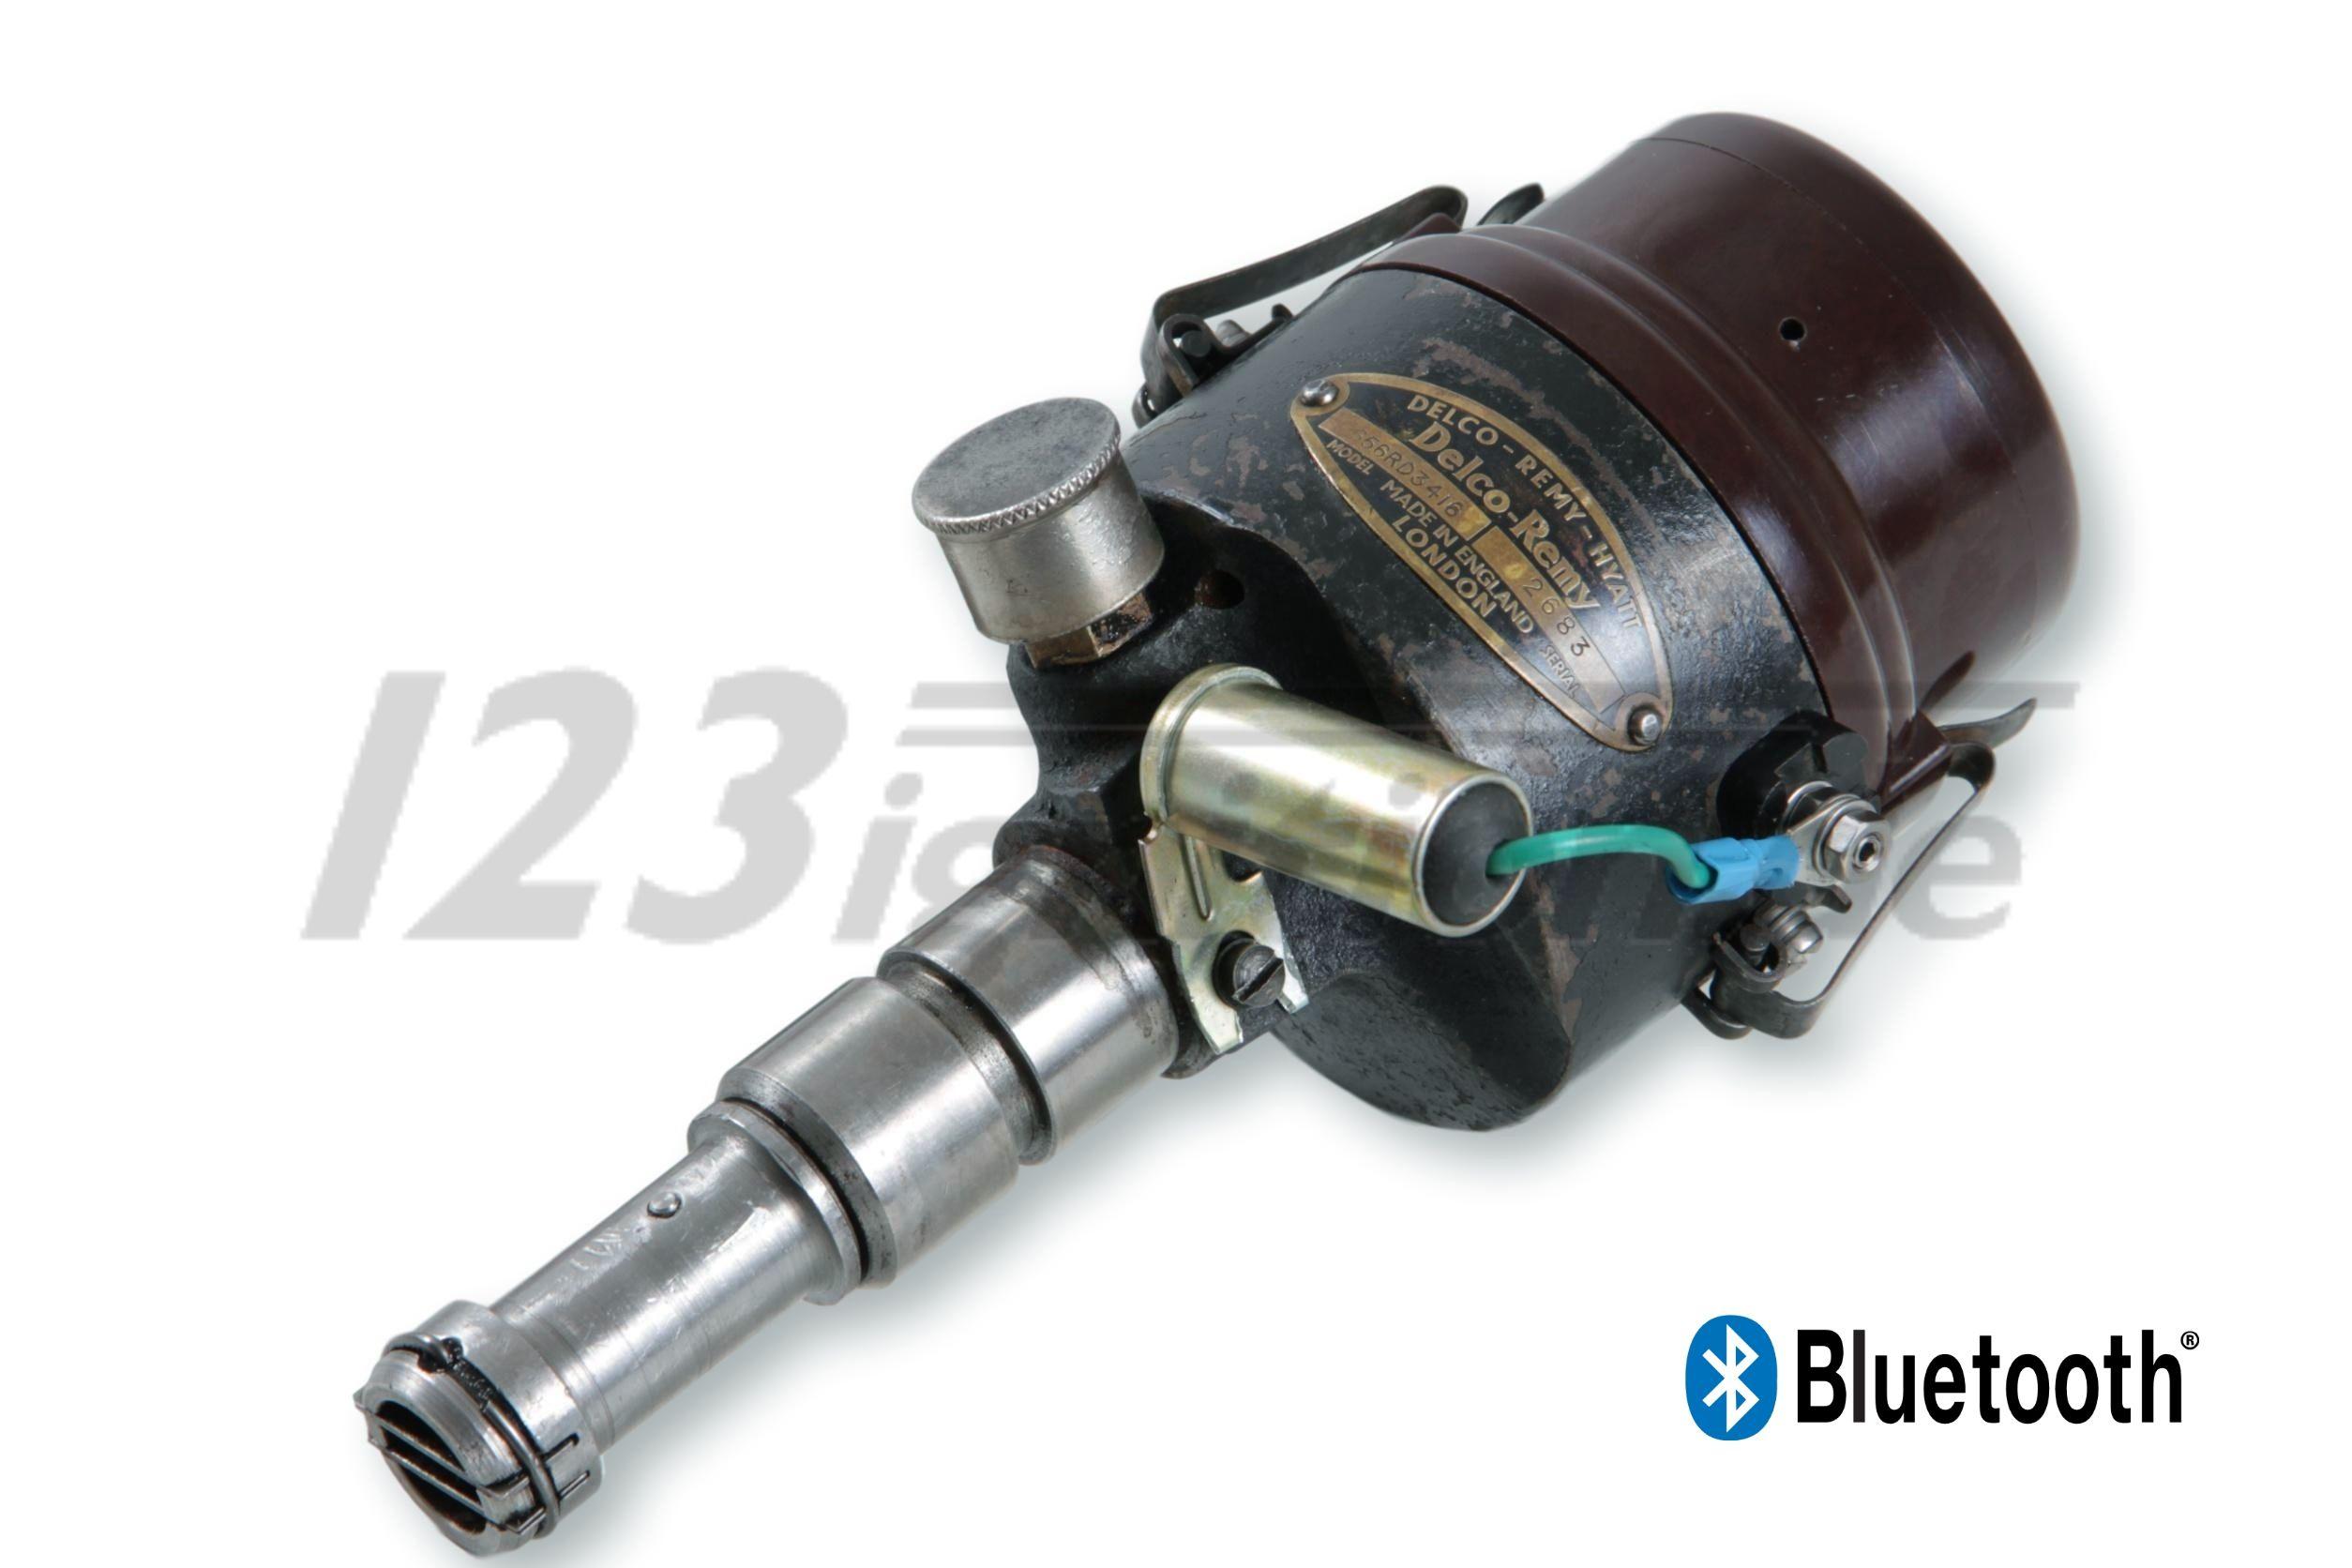 123ignition Rolls Royce Silver Dawn Wraith Online Shop Fuel Pump 123tune Bluetooth Distributor For